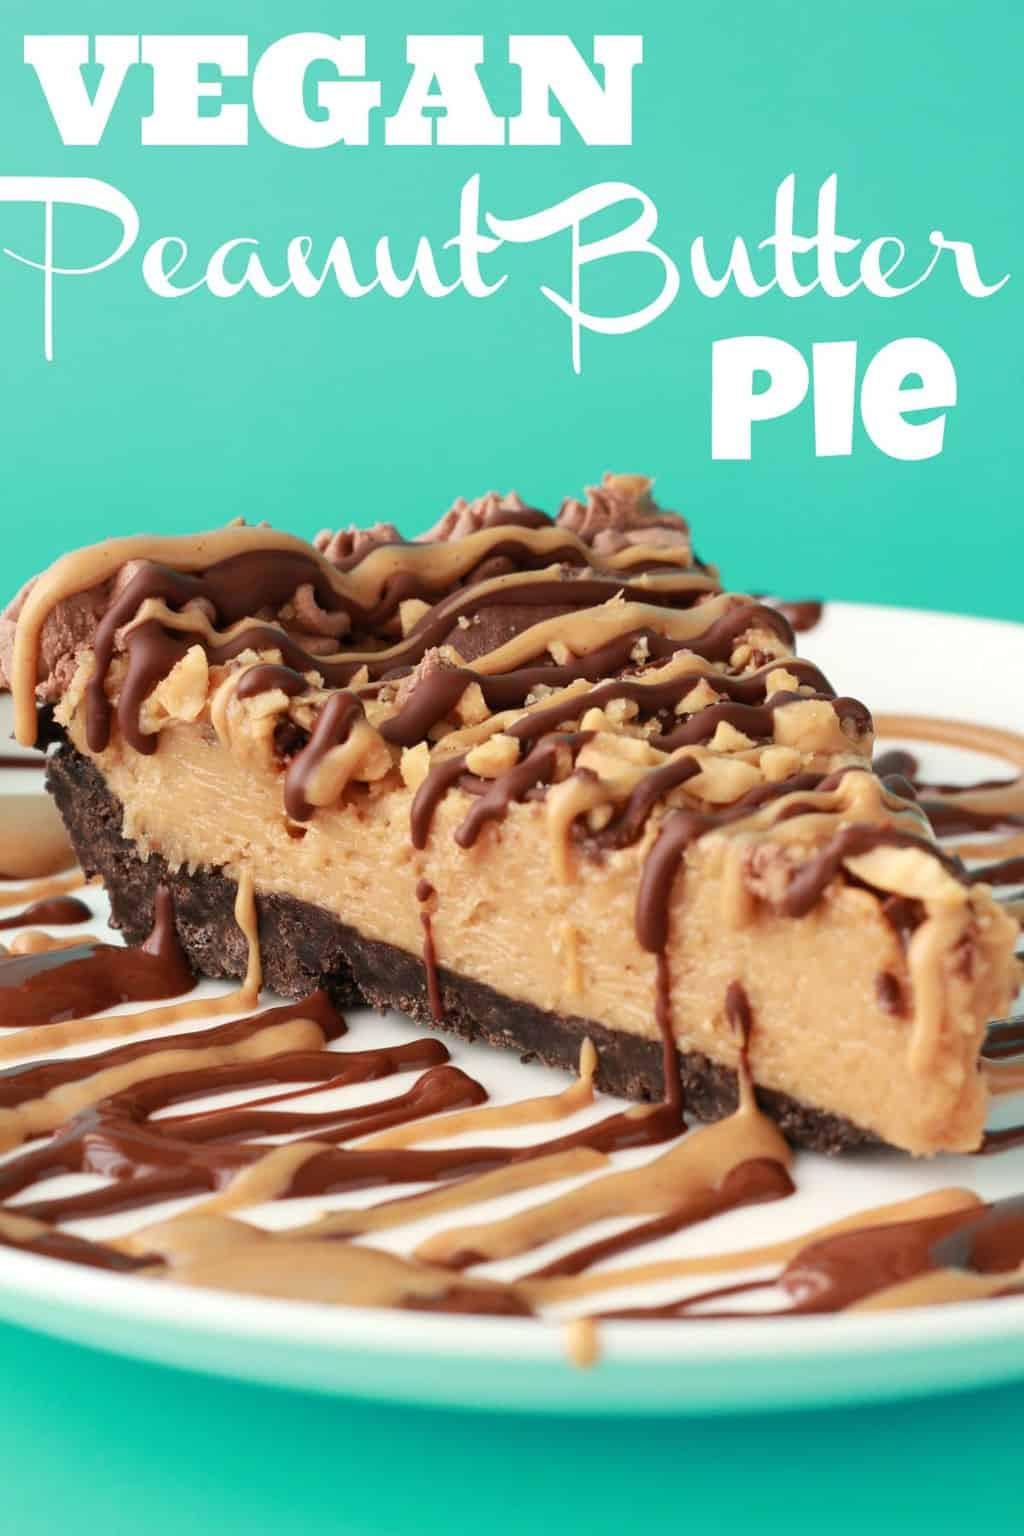 Vegan Peanut Butter Pie  Vegan Peanut Butter Pie Loving It Vegan